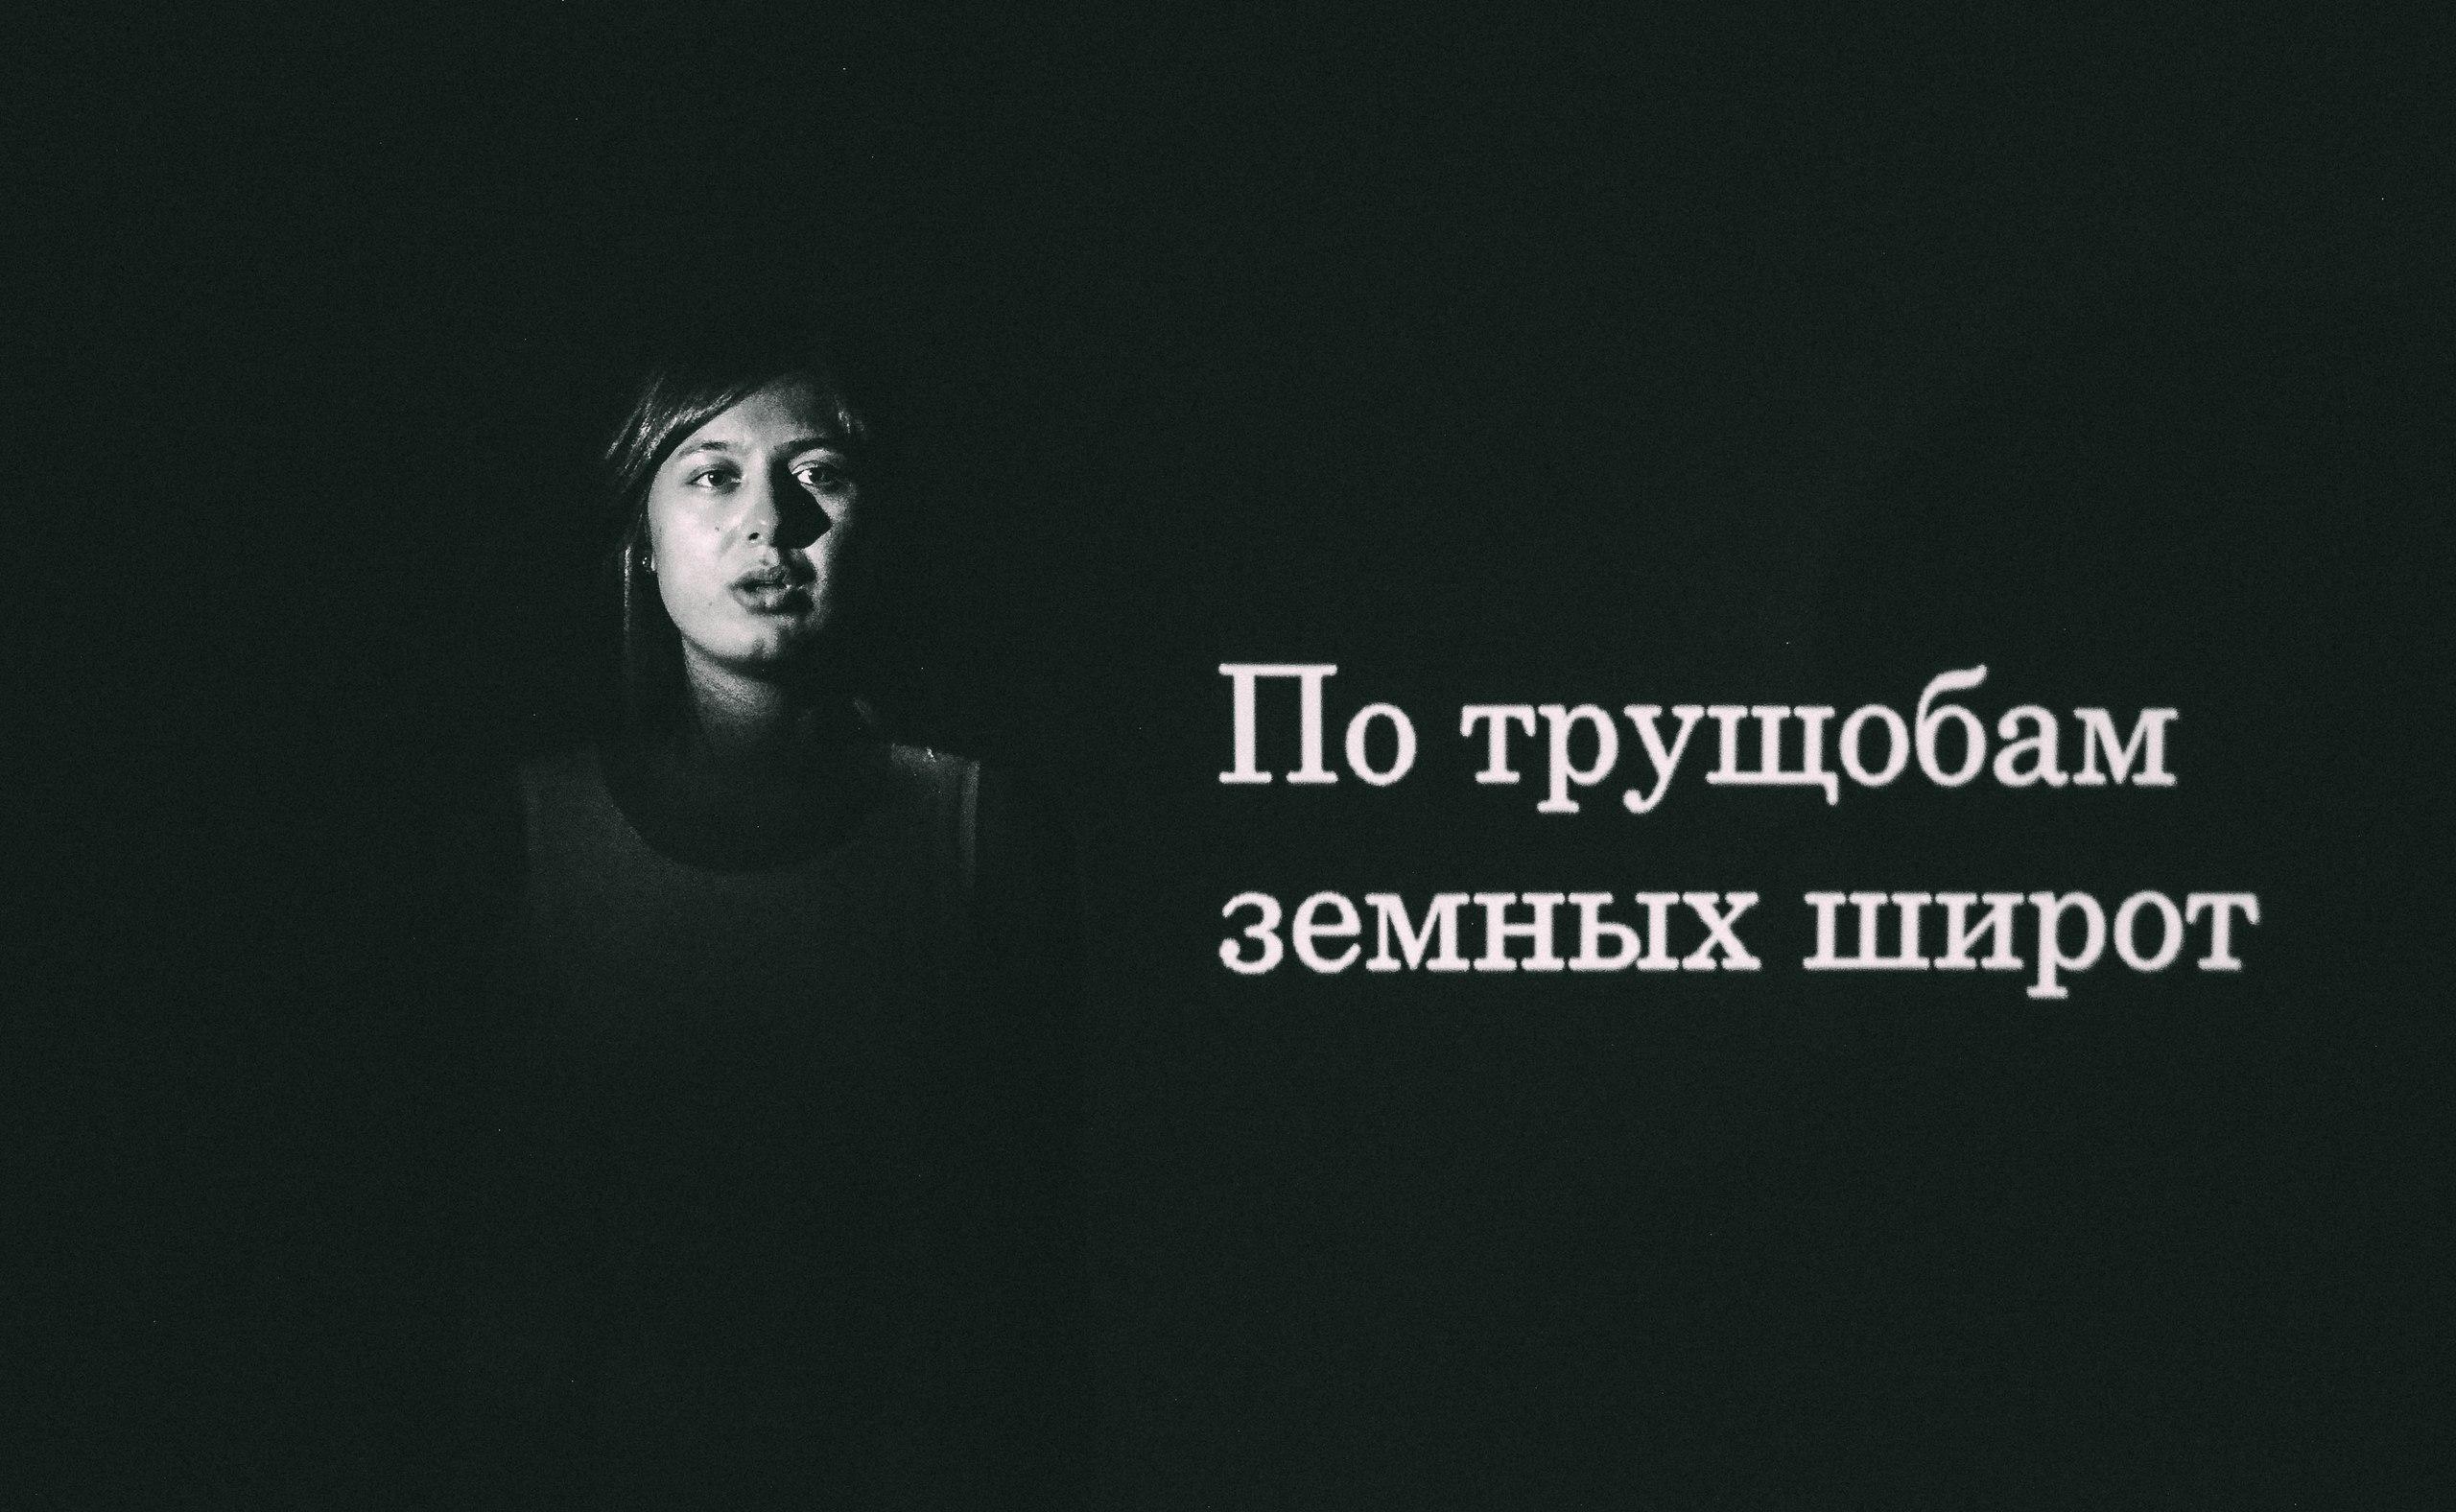 Оксана Бырлиба